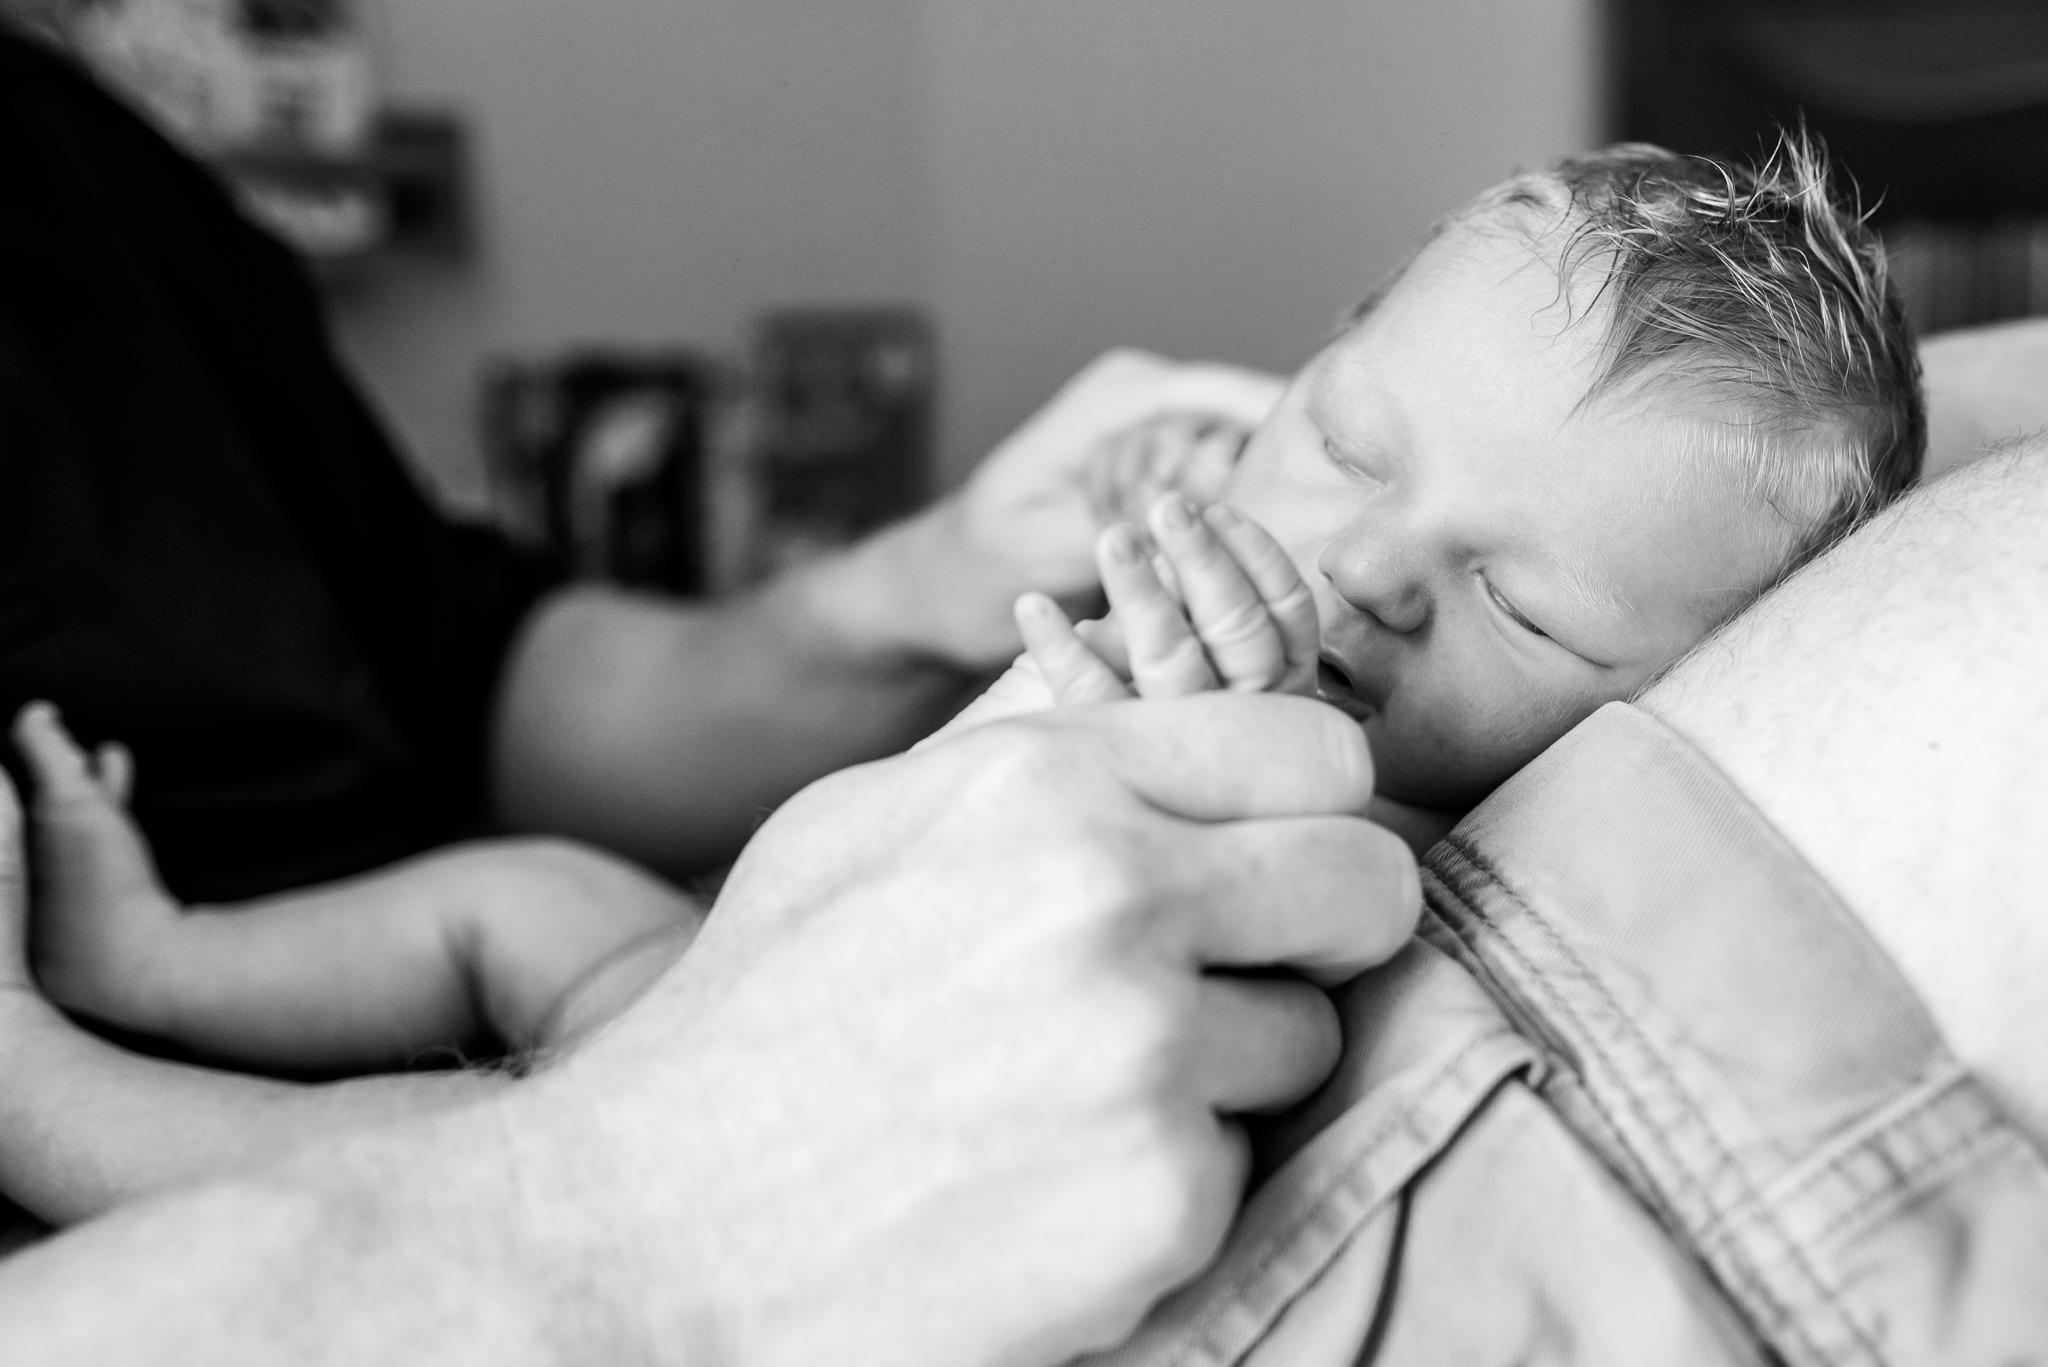 Round Rock Newborn Photographer_Emily Ingalls Photography_Newborn Photoraphy_Pflugerville Newborn Photographer_Hutto Newborn Photographer_Austin Newborn Photographer_Georgetown Newborn Photographer-21.jpg